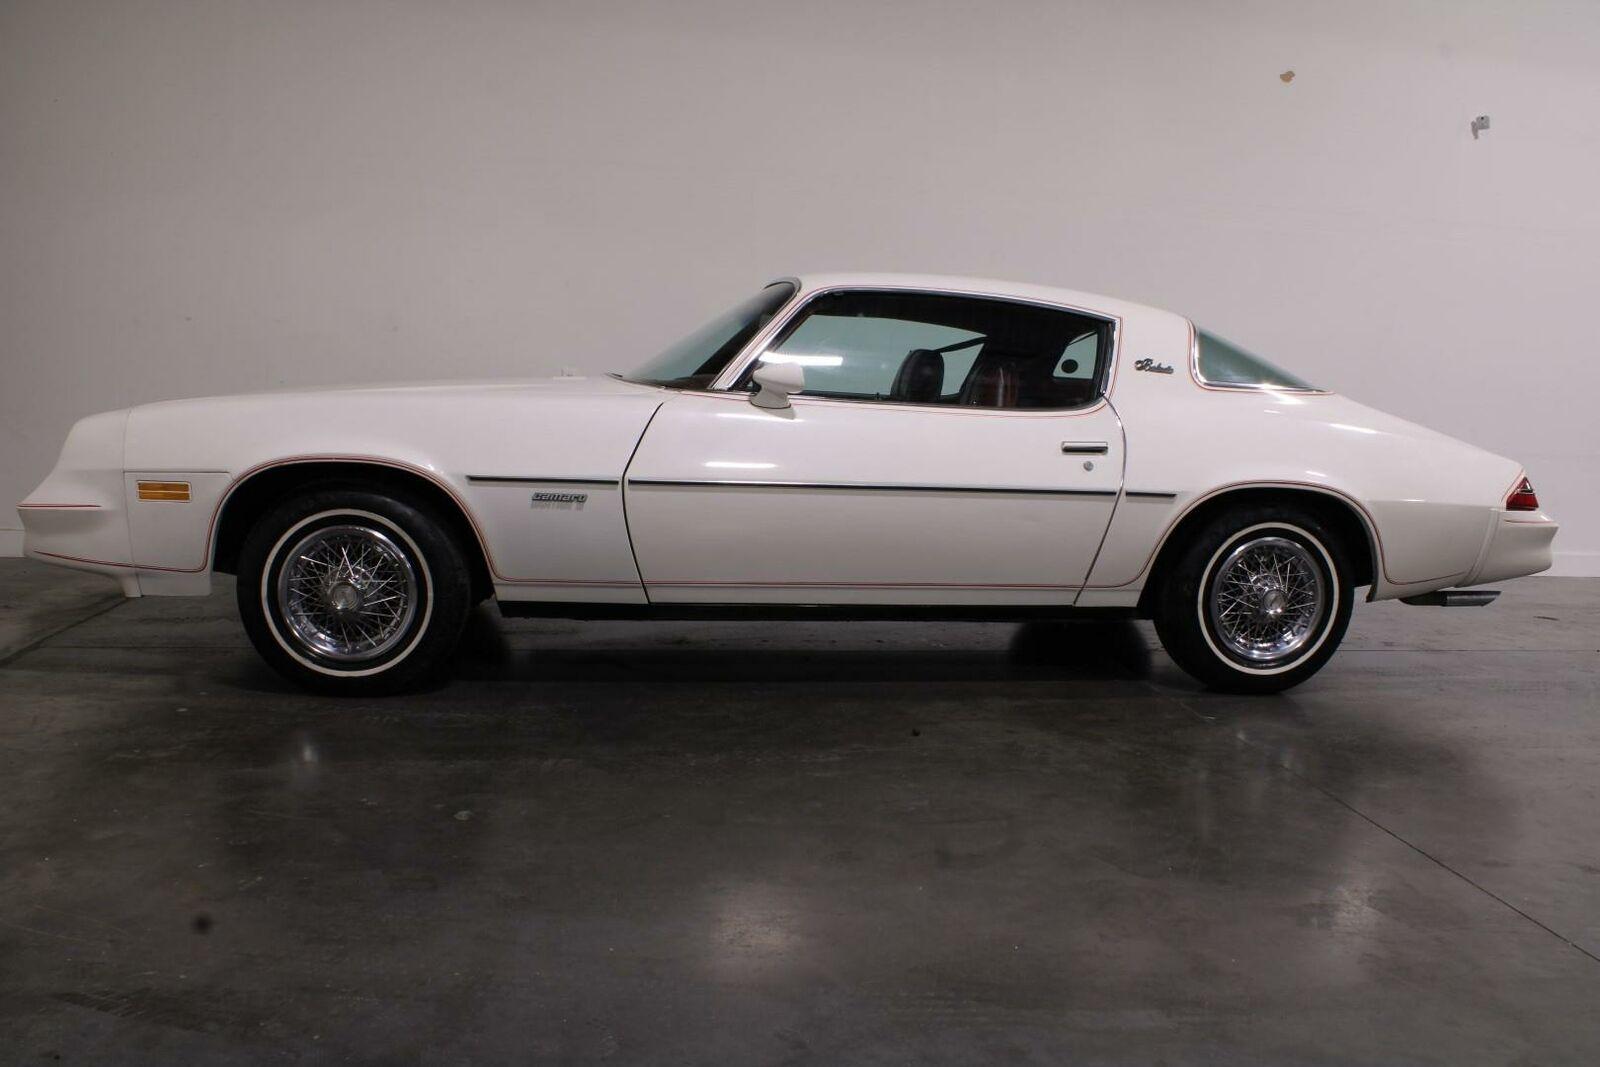 1980 Chevrolet Camaro V8 Automatic Coupe  White